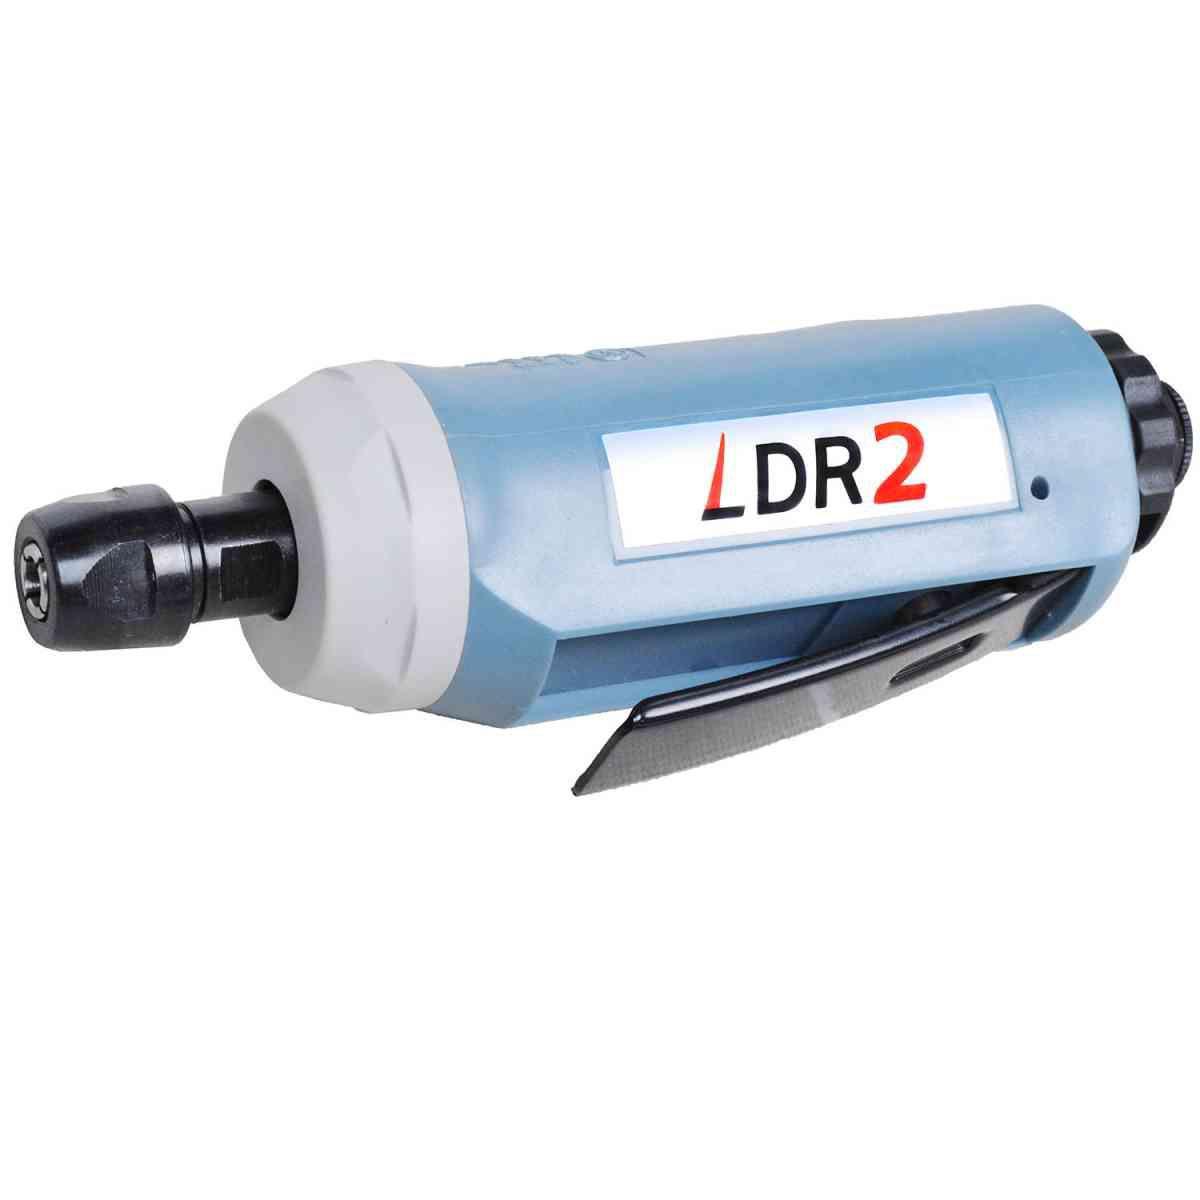 "RETIFICA PNEUMATICA 1/4"" 0,3HP 22.000RPM PROFISSIONAl DR3-4875 LDR2"